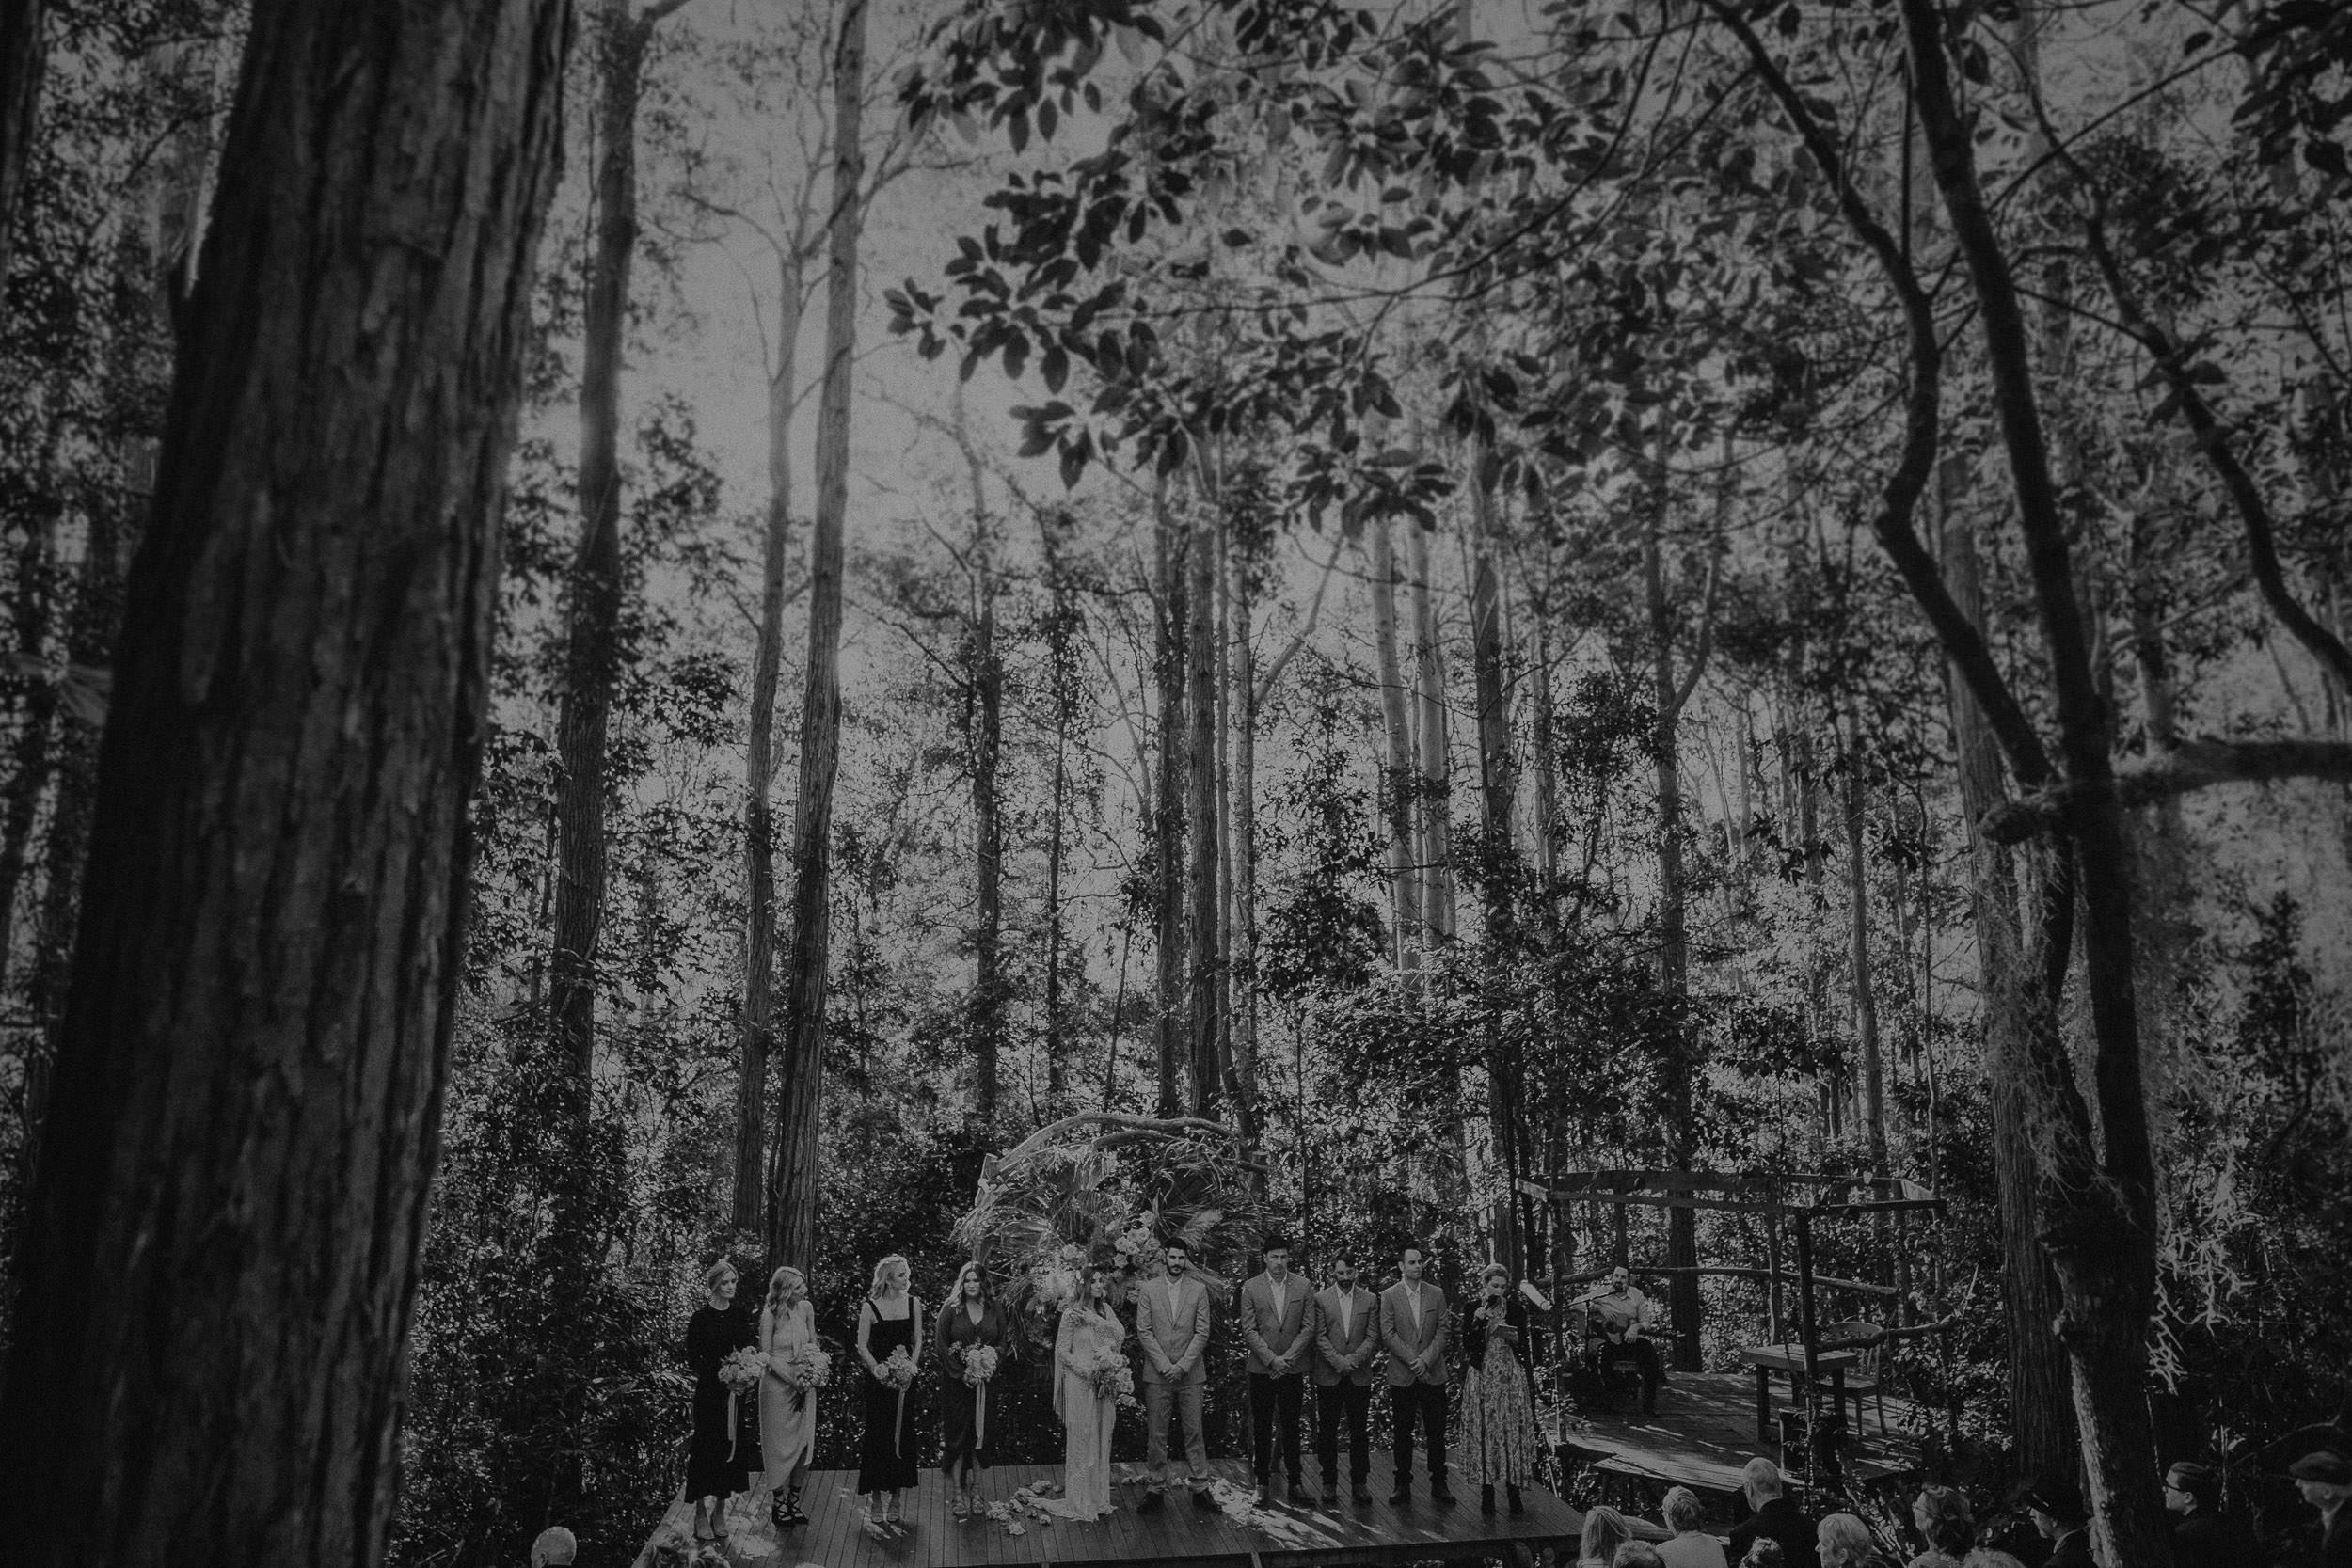 S&A Elopement - Kings & Thieves - Shred 'Til Dead - Central Coast Beach Forest Wedding - 183.jpg